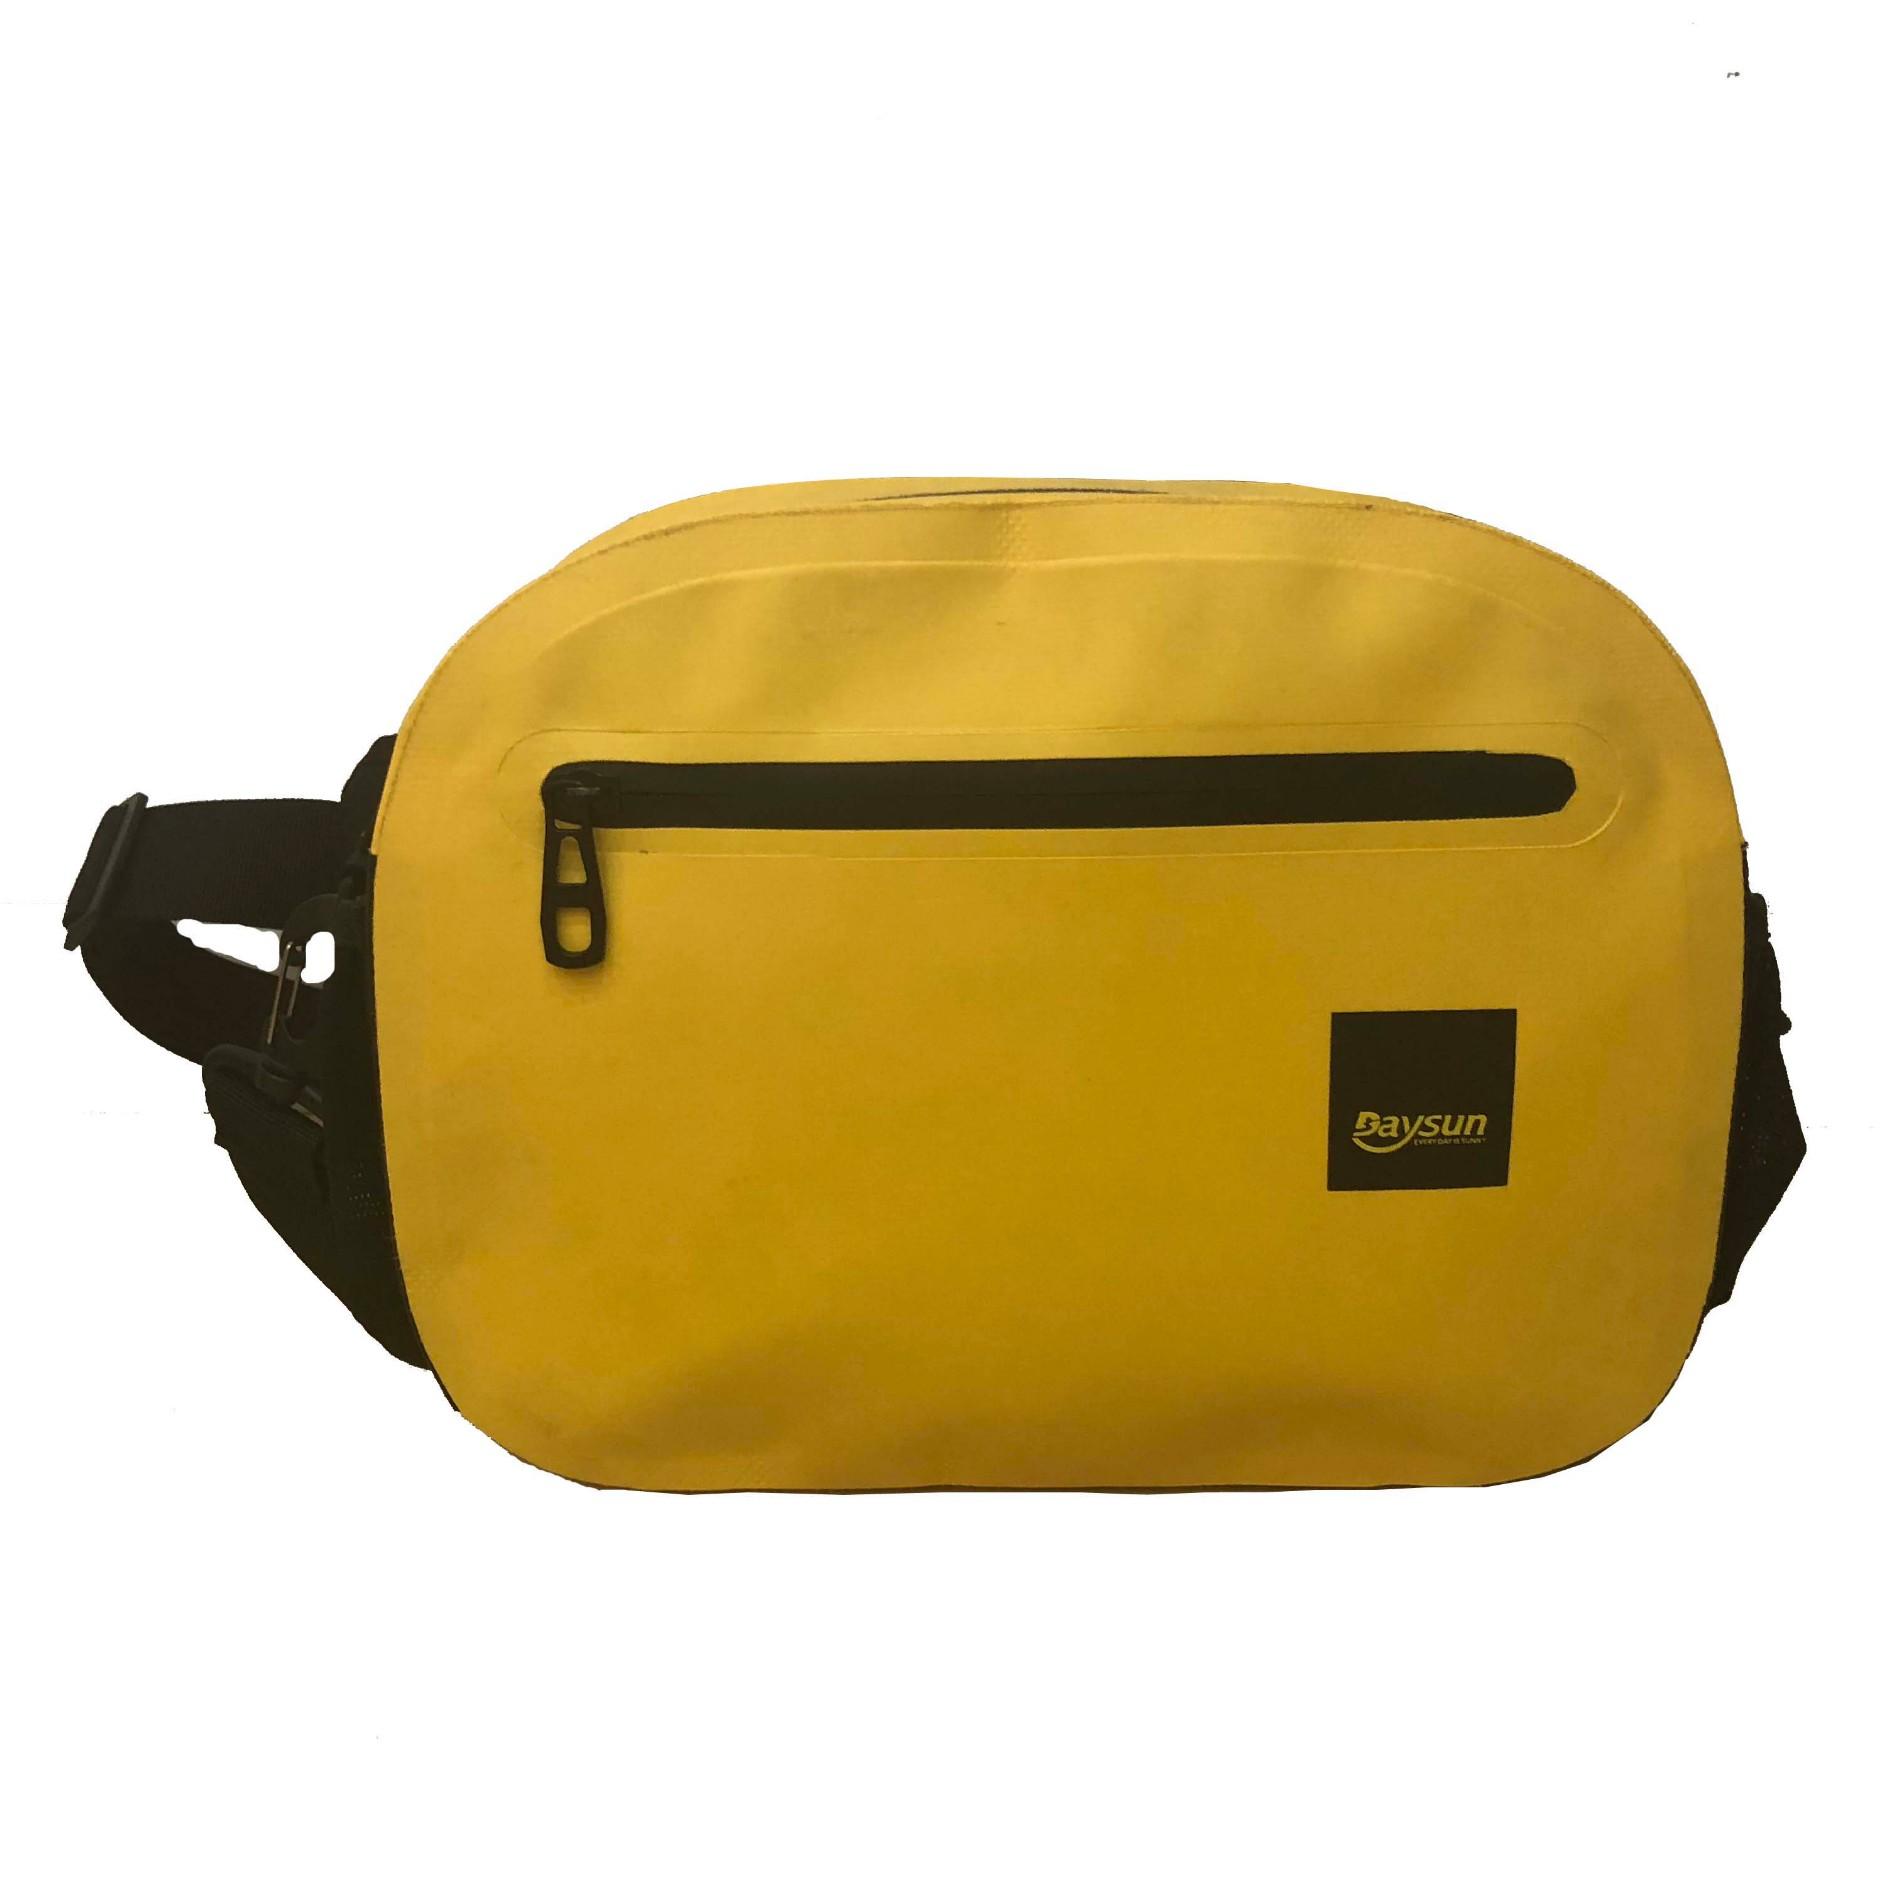 Fanny-pack voor droge zakken